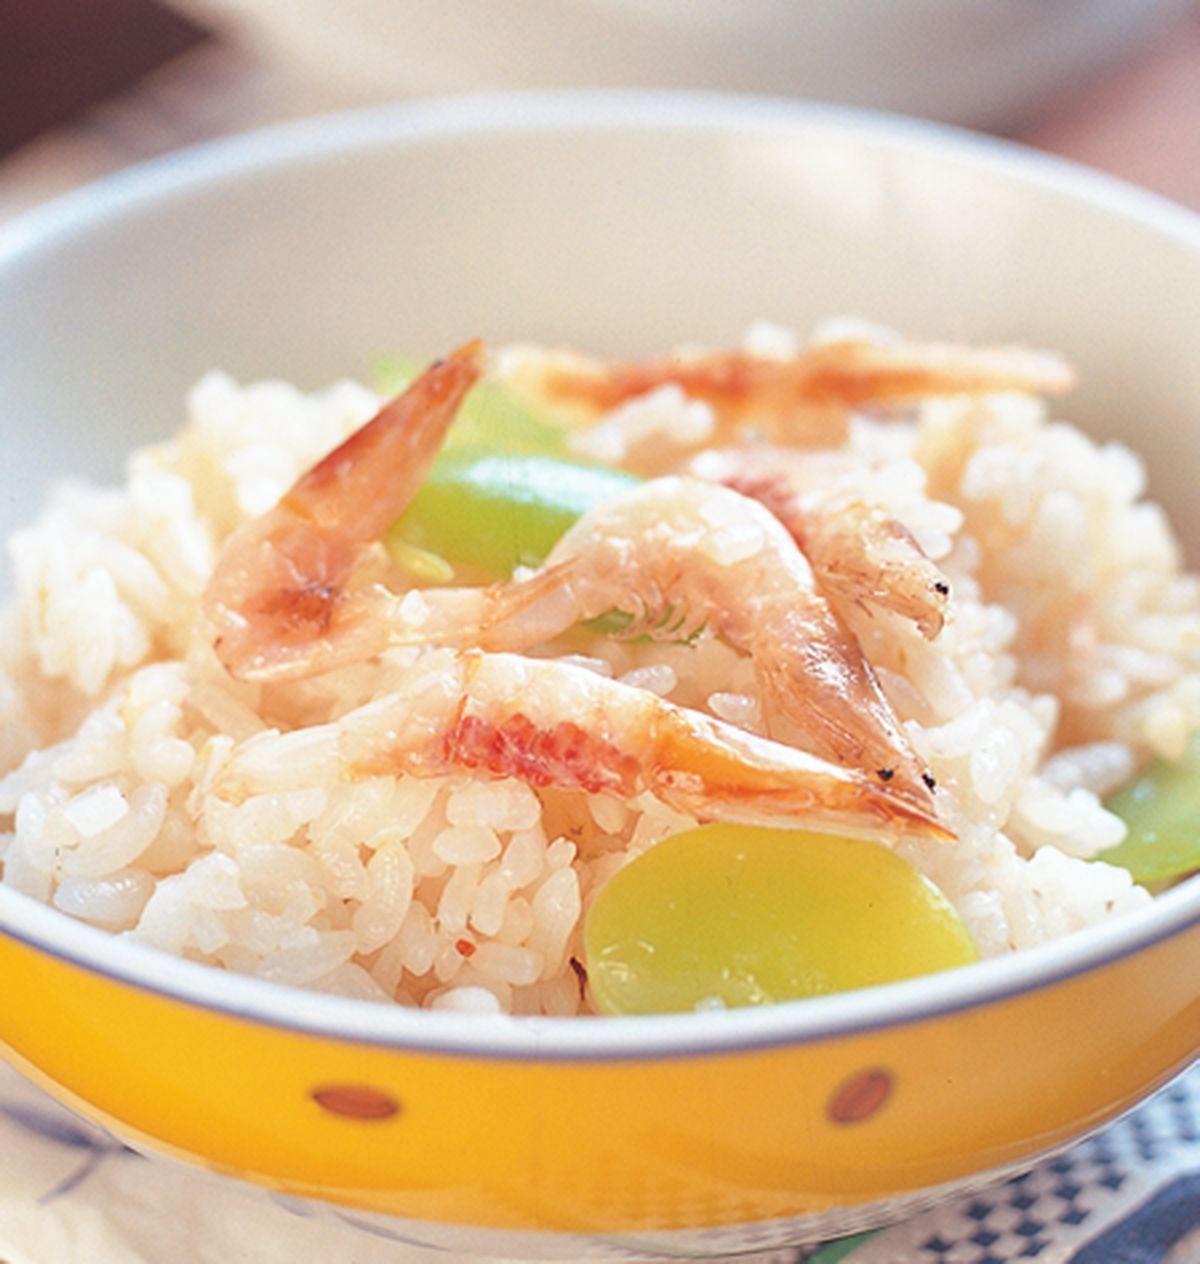 食譜:櫻花蝦飯